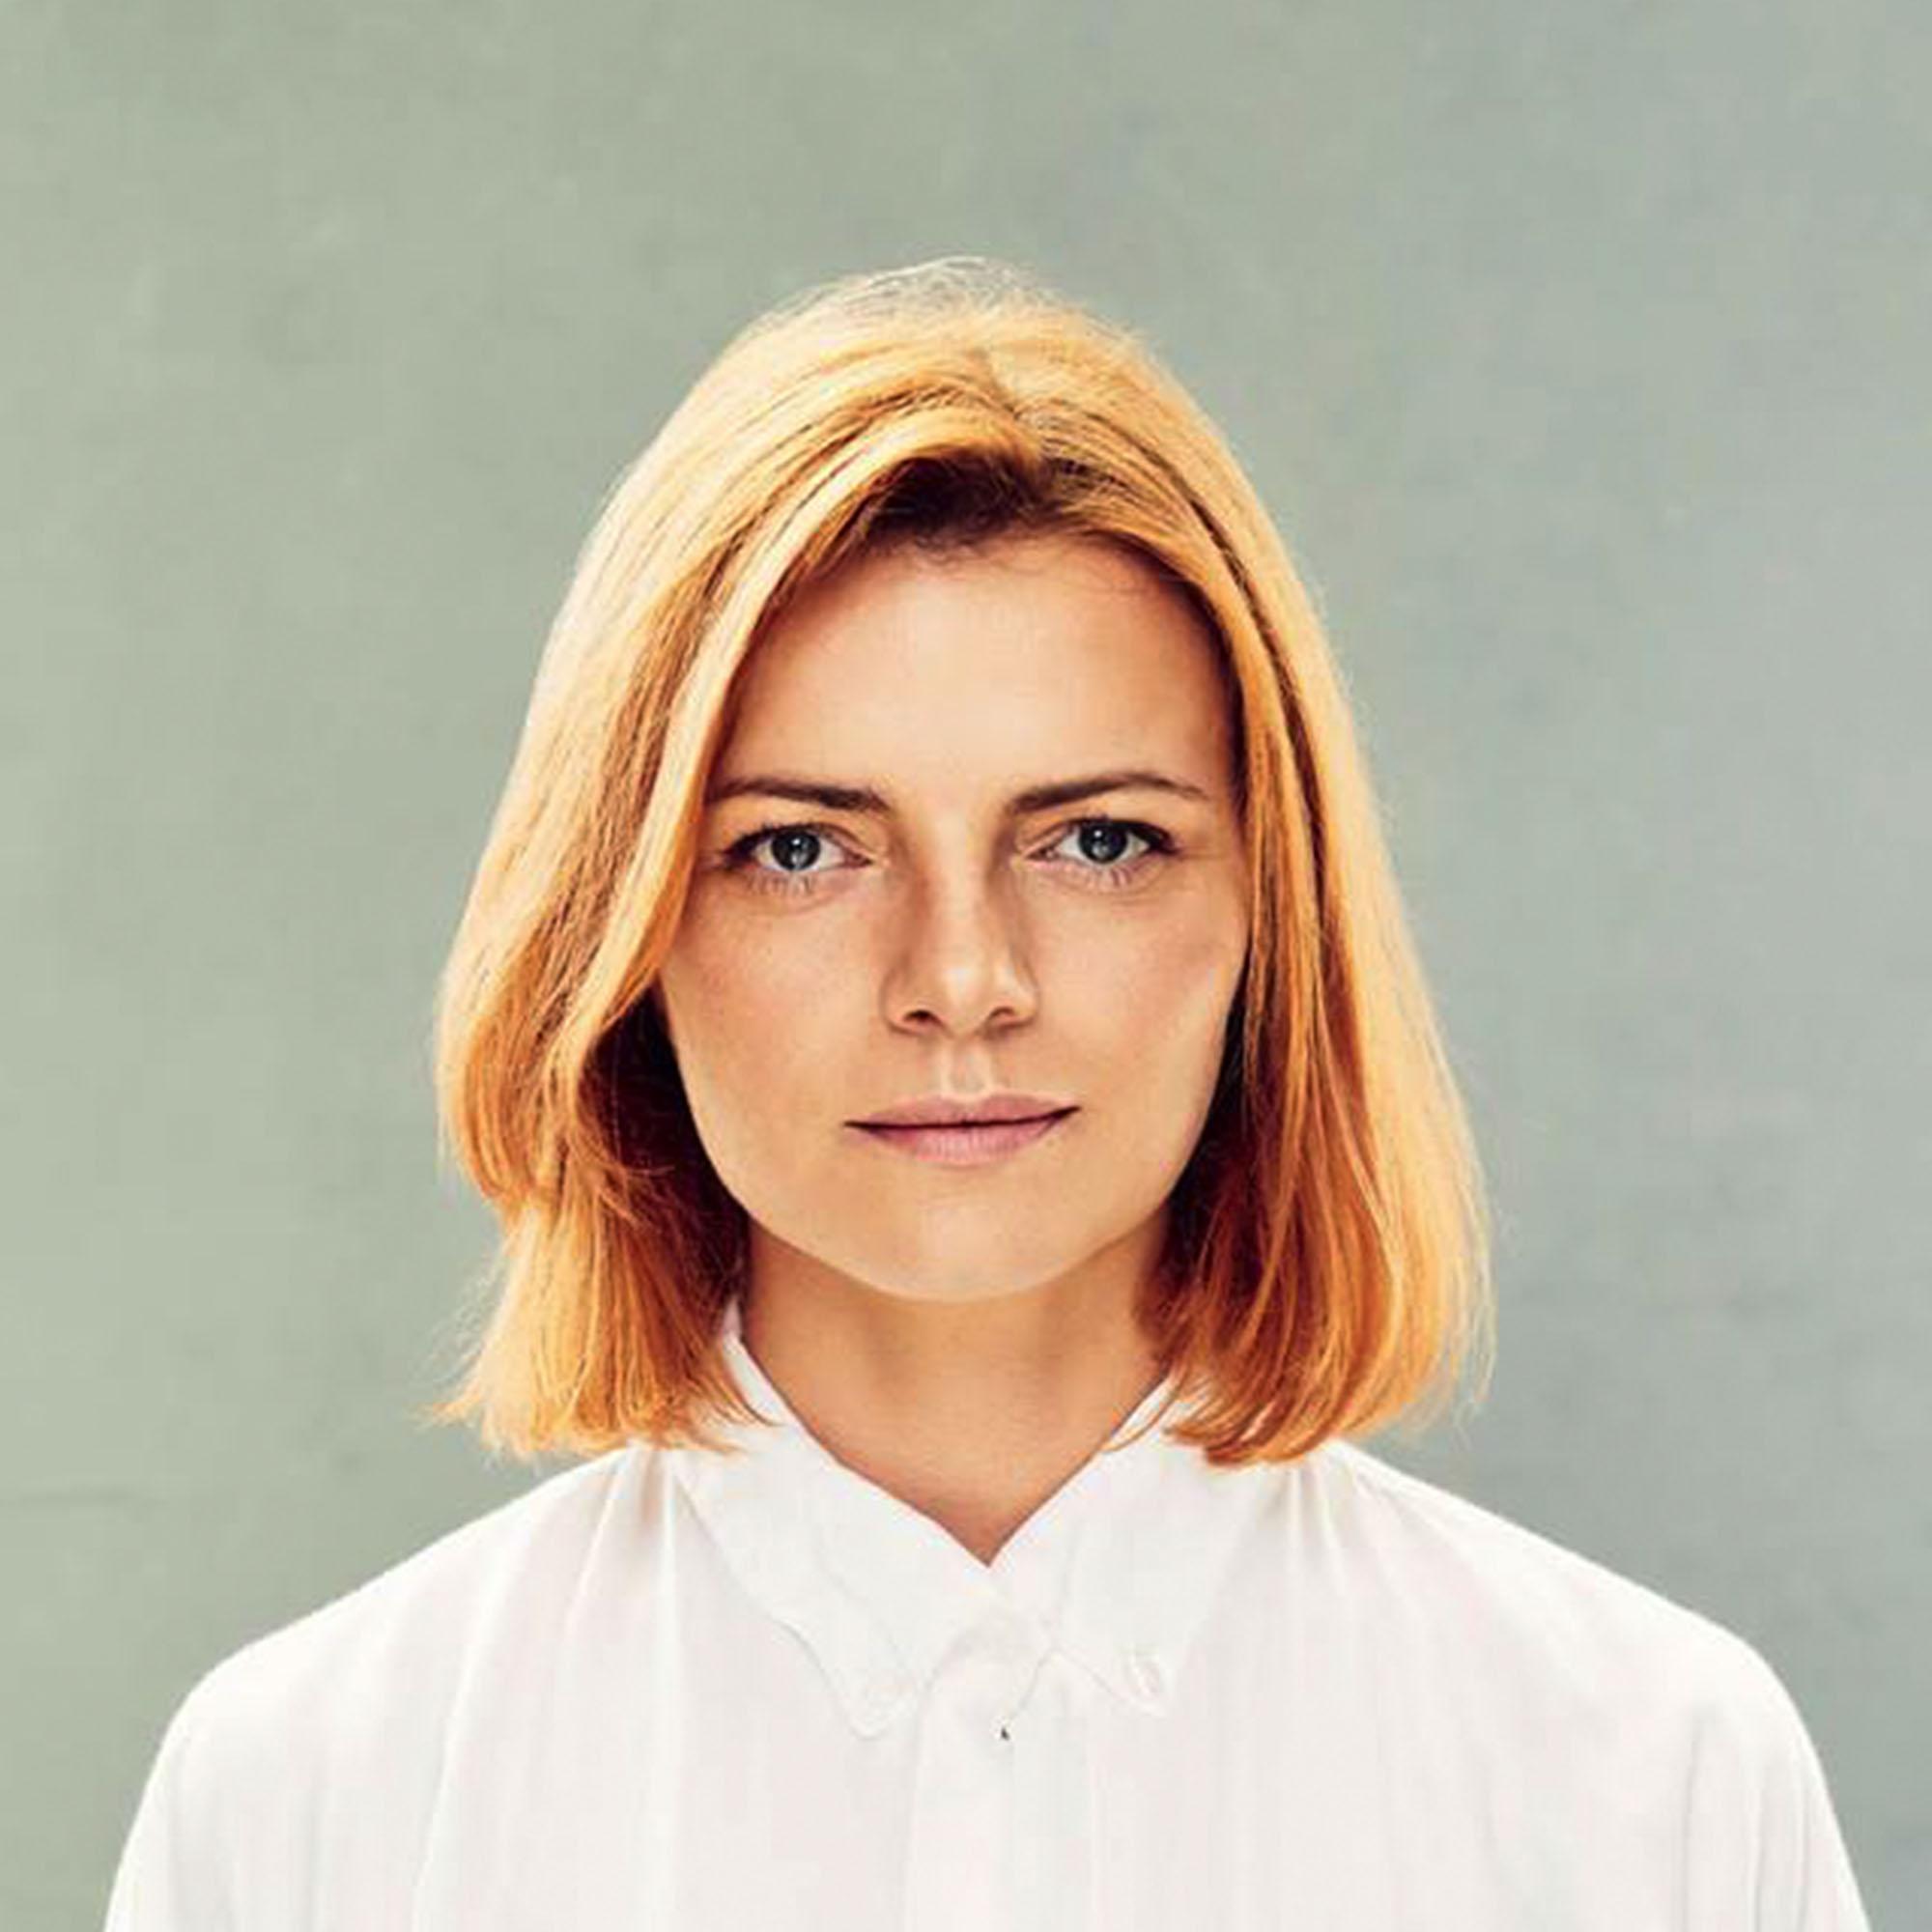 anna kopaczewska hairstylist